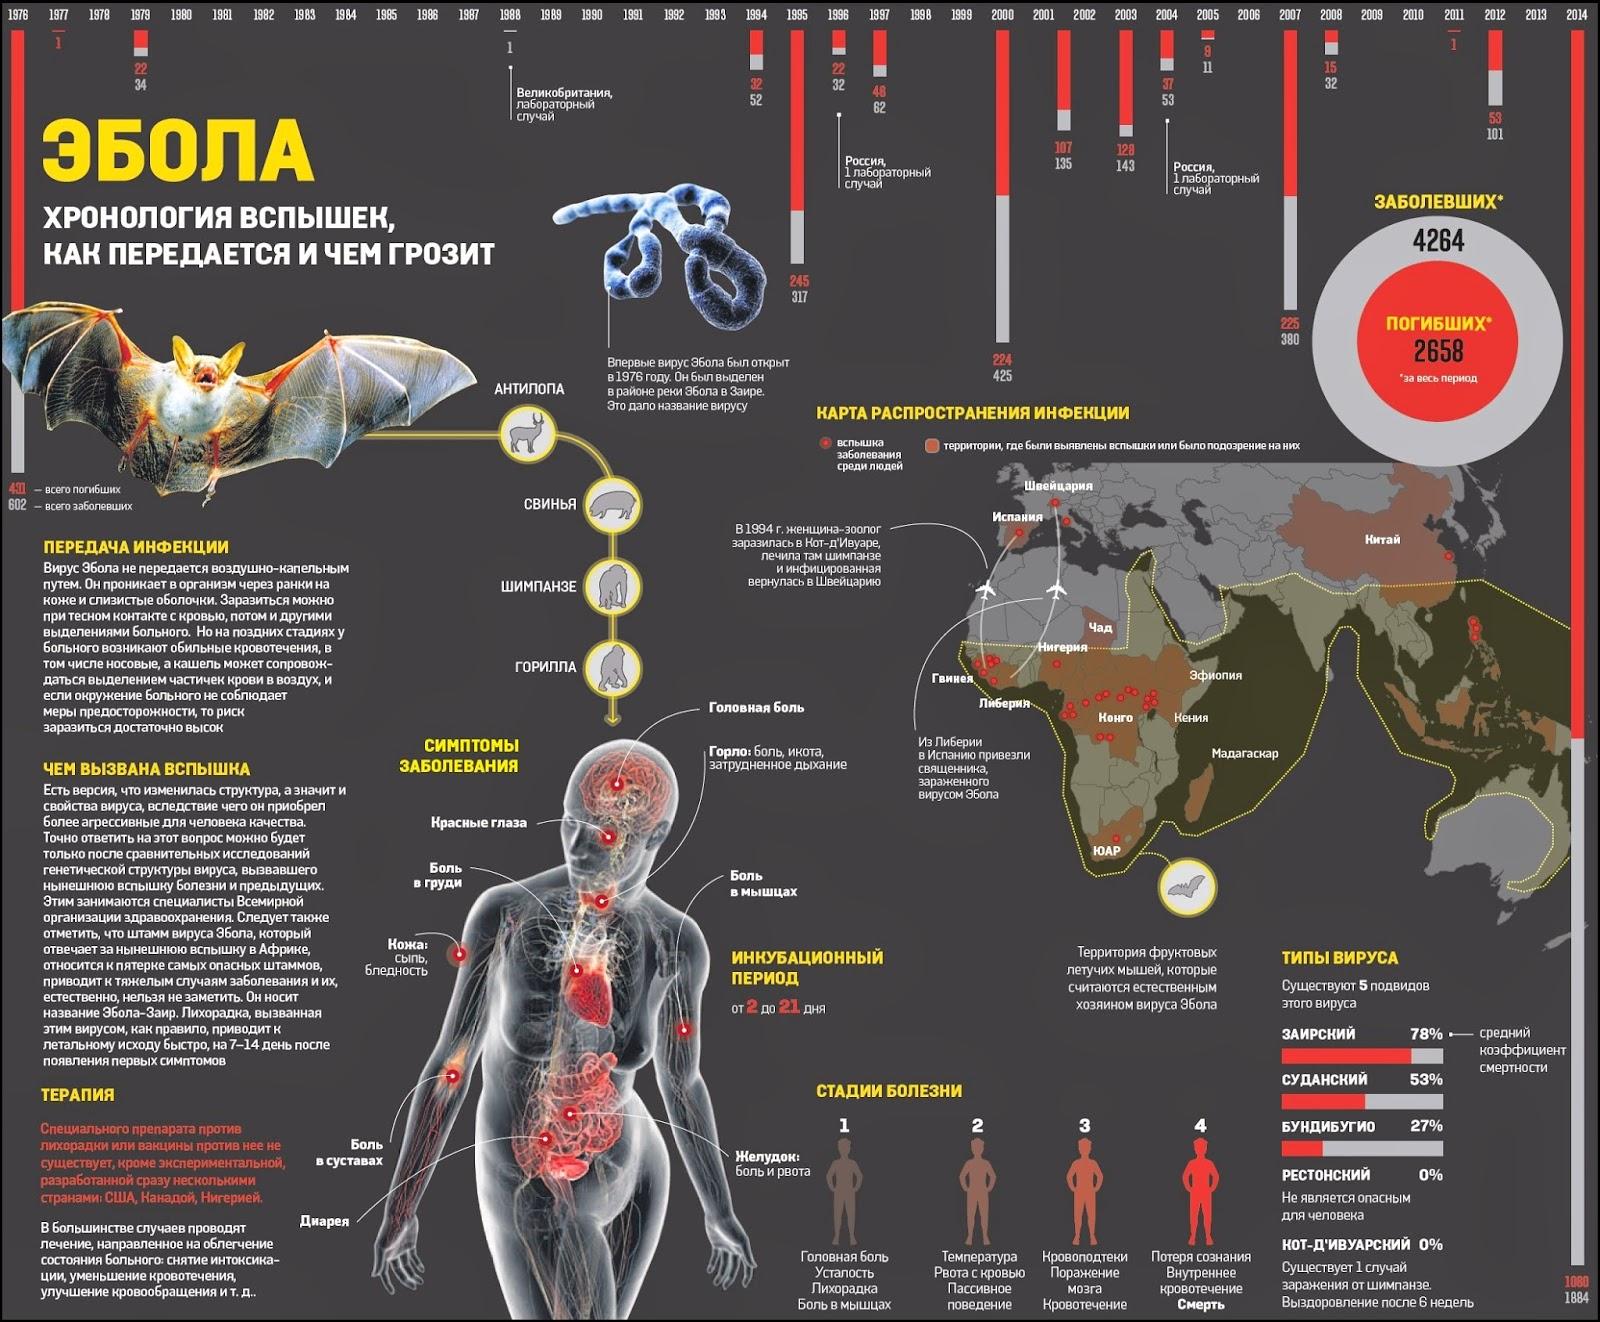 Хронология вспышек Эболы